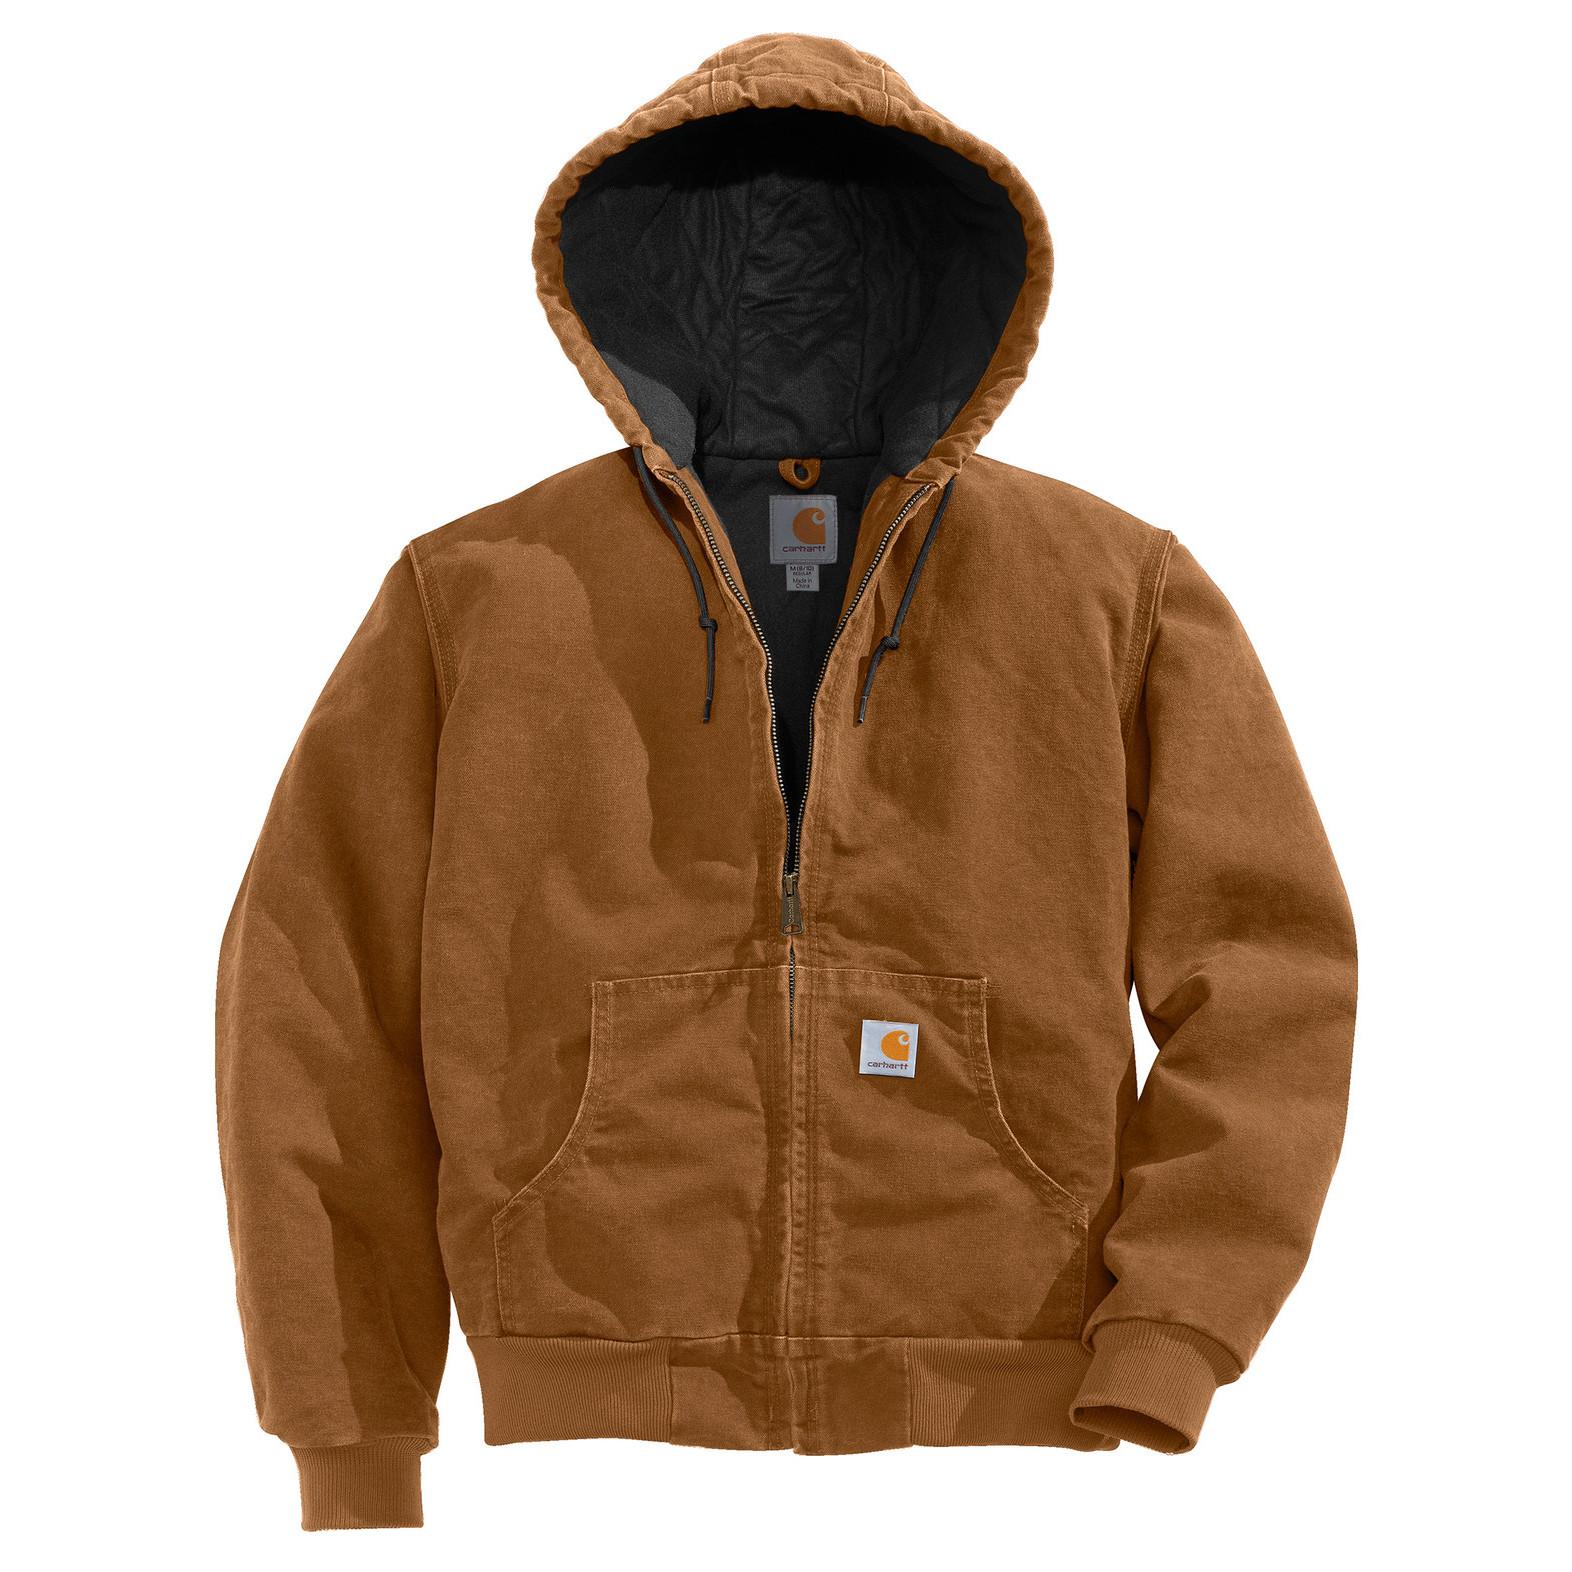 Куртка-кенгуру Carhartt Sandstone Active Jacket - J130 (Carhartt Brown, M)